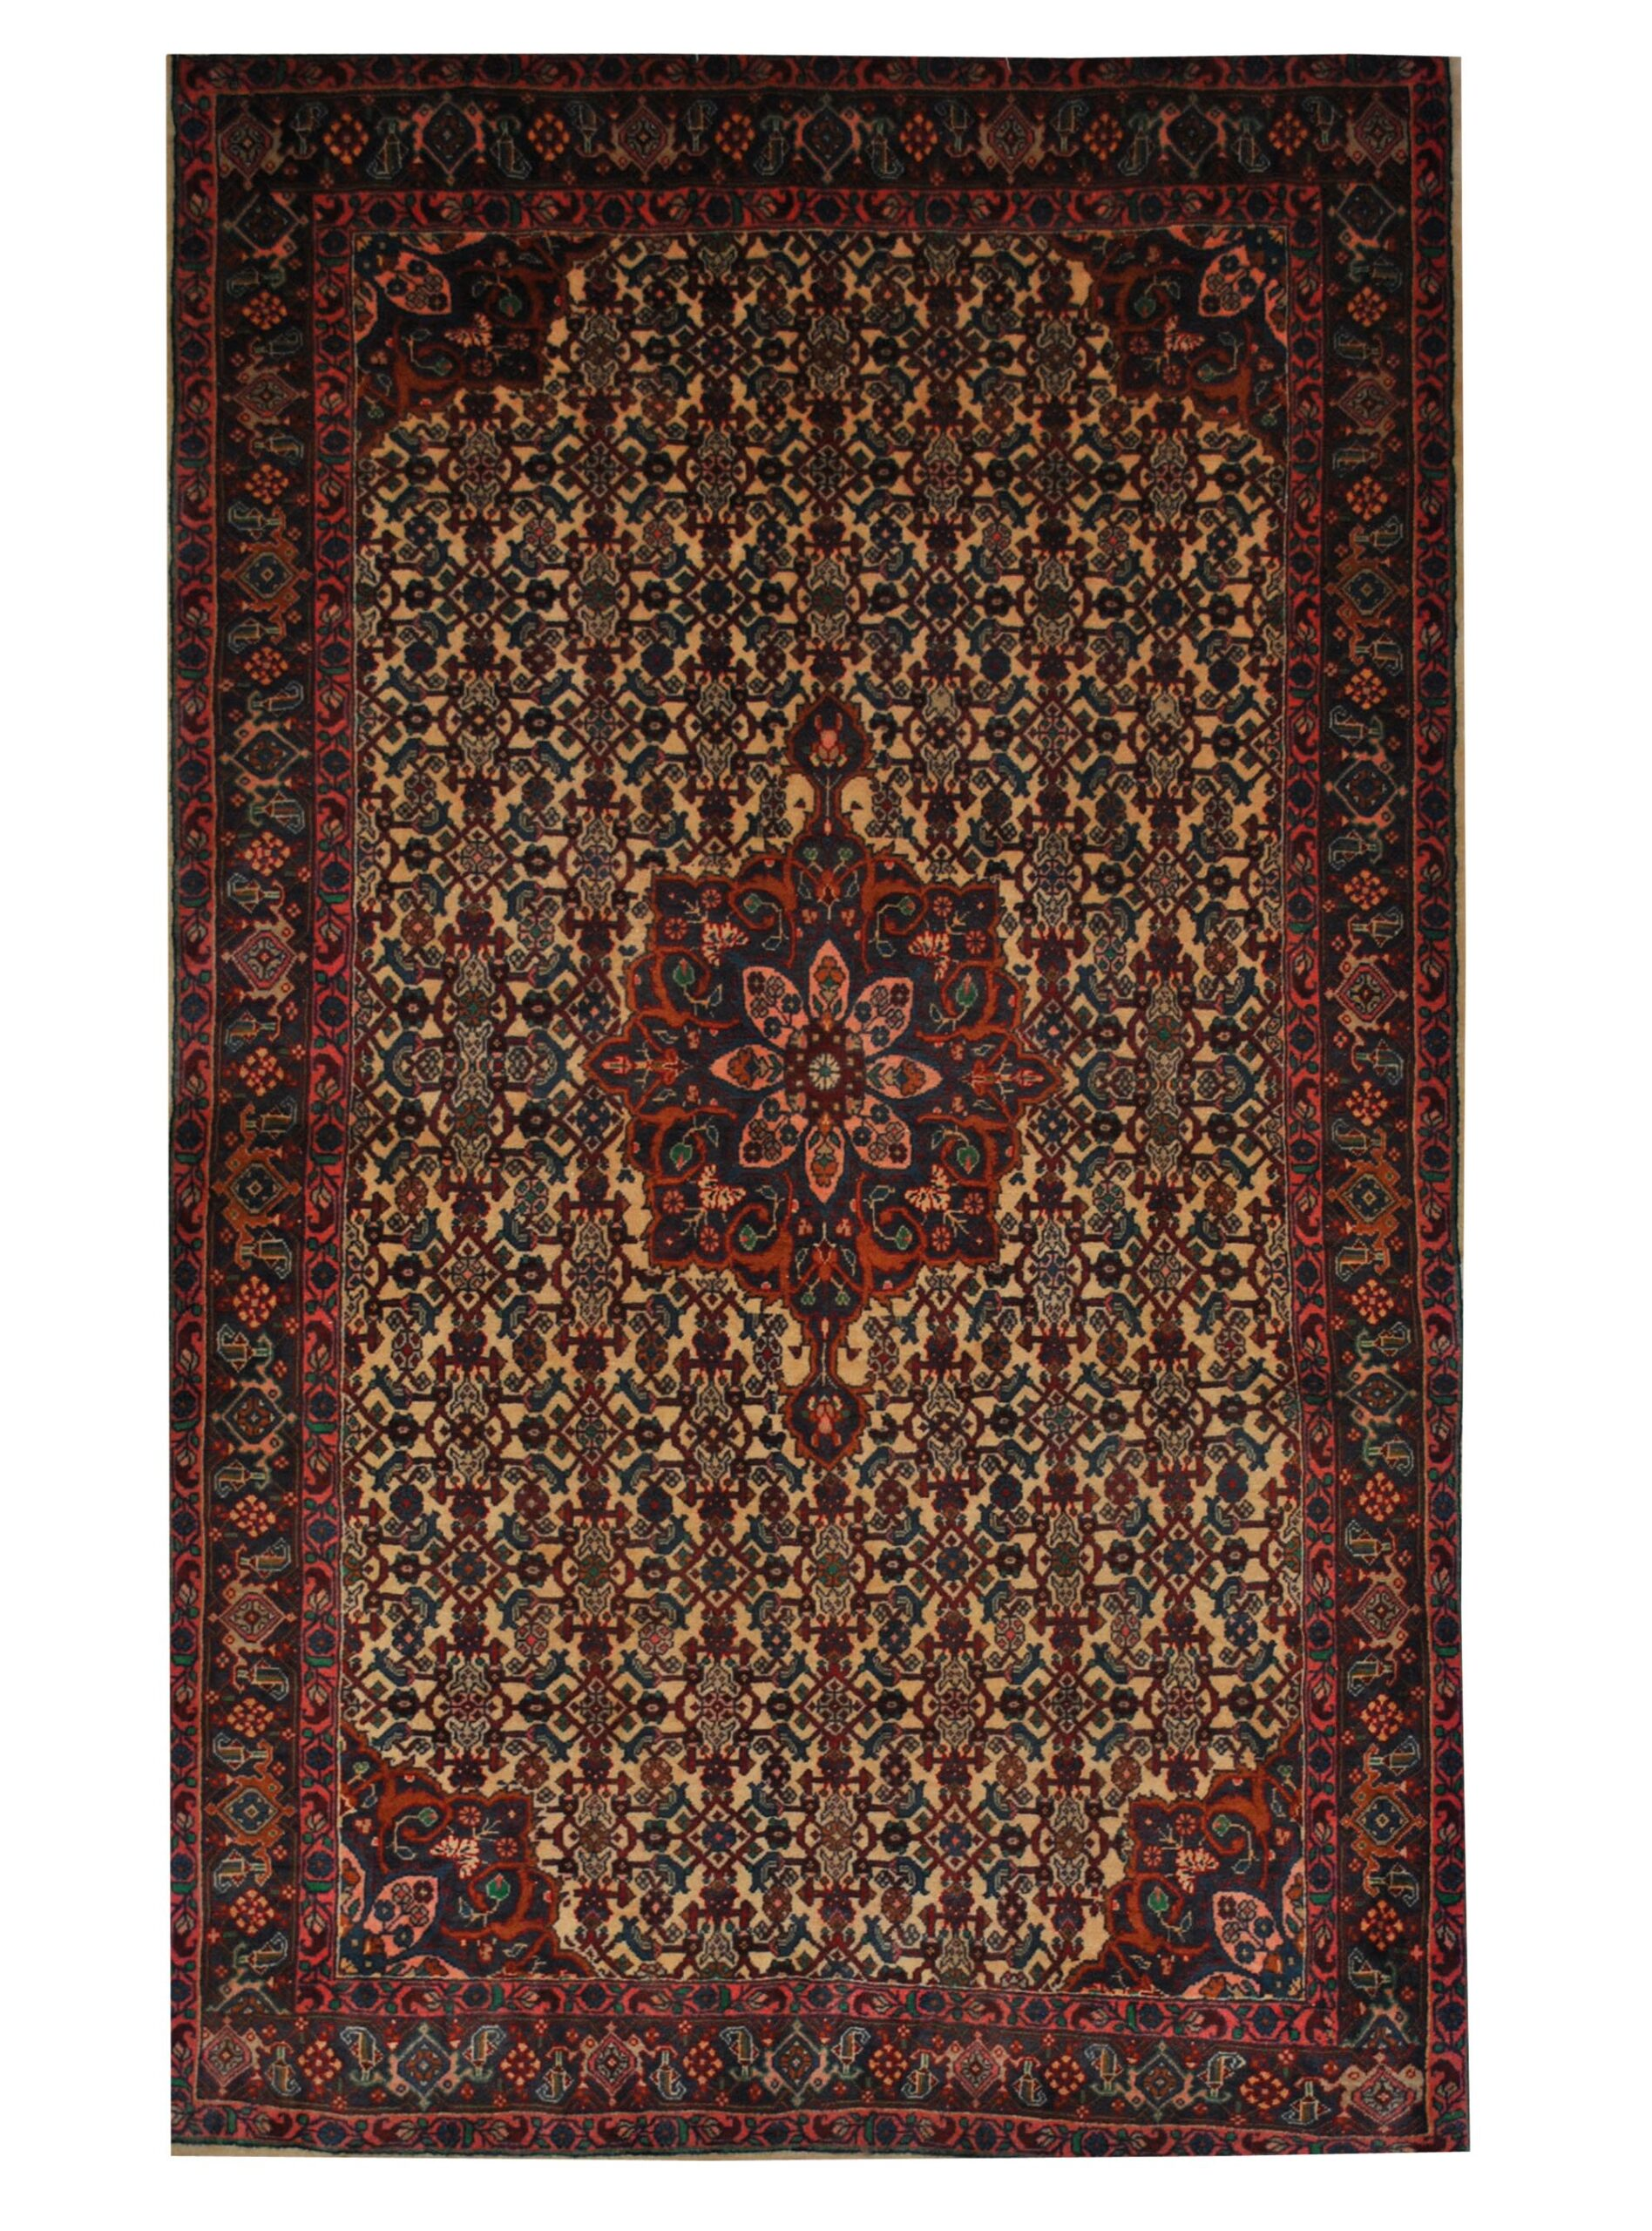 "Vintage Persian Sarouk 4' 2"" x 6' 10"" Handmade Wool Area Rug - Shabahang Royal Carpet"